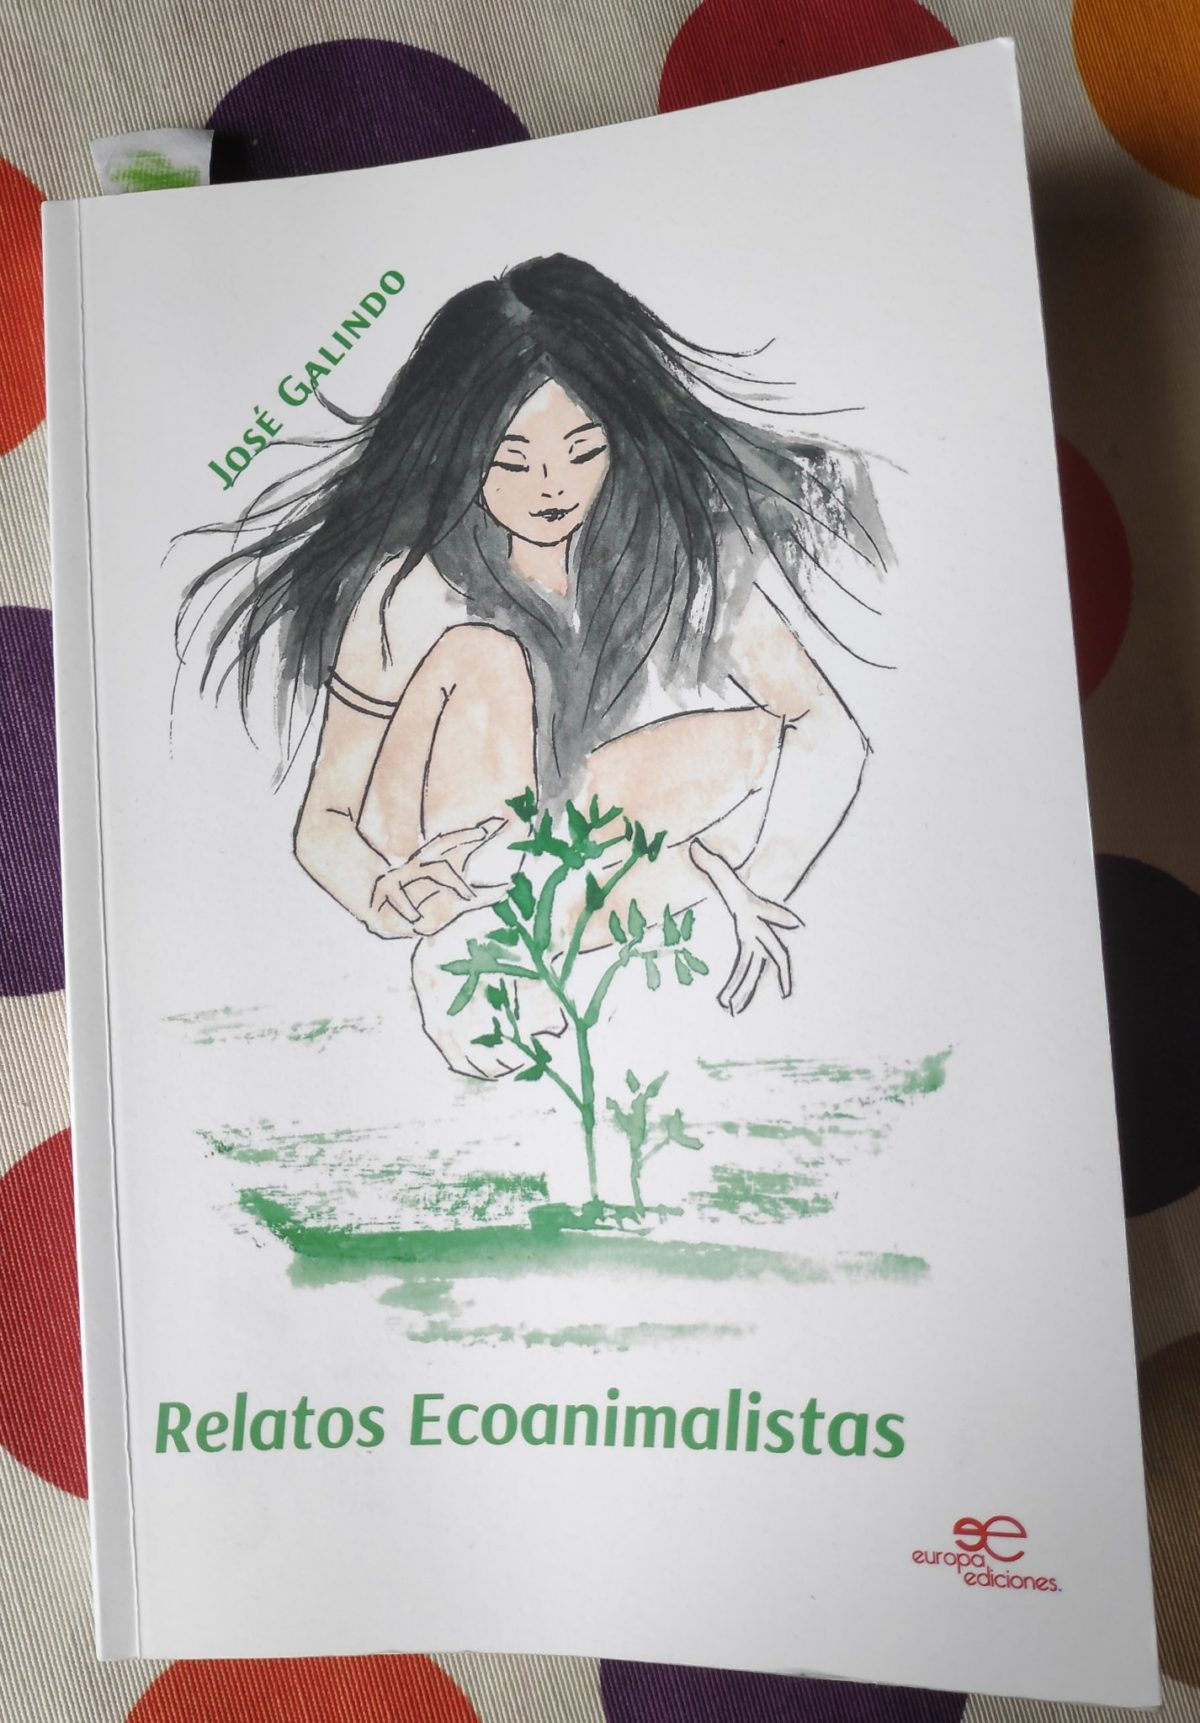 Relatos Ecoanimalistas